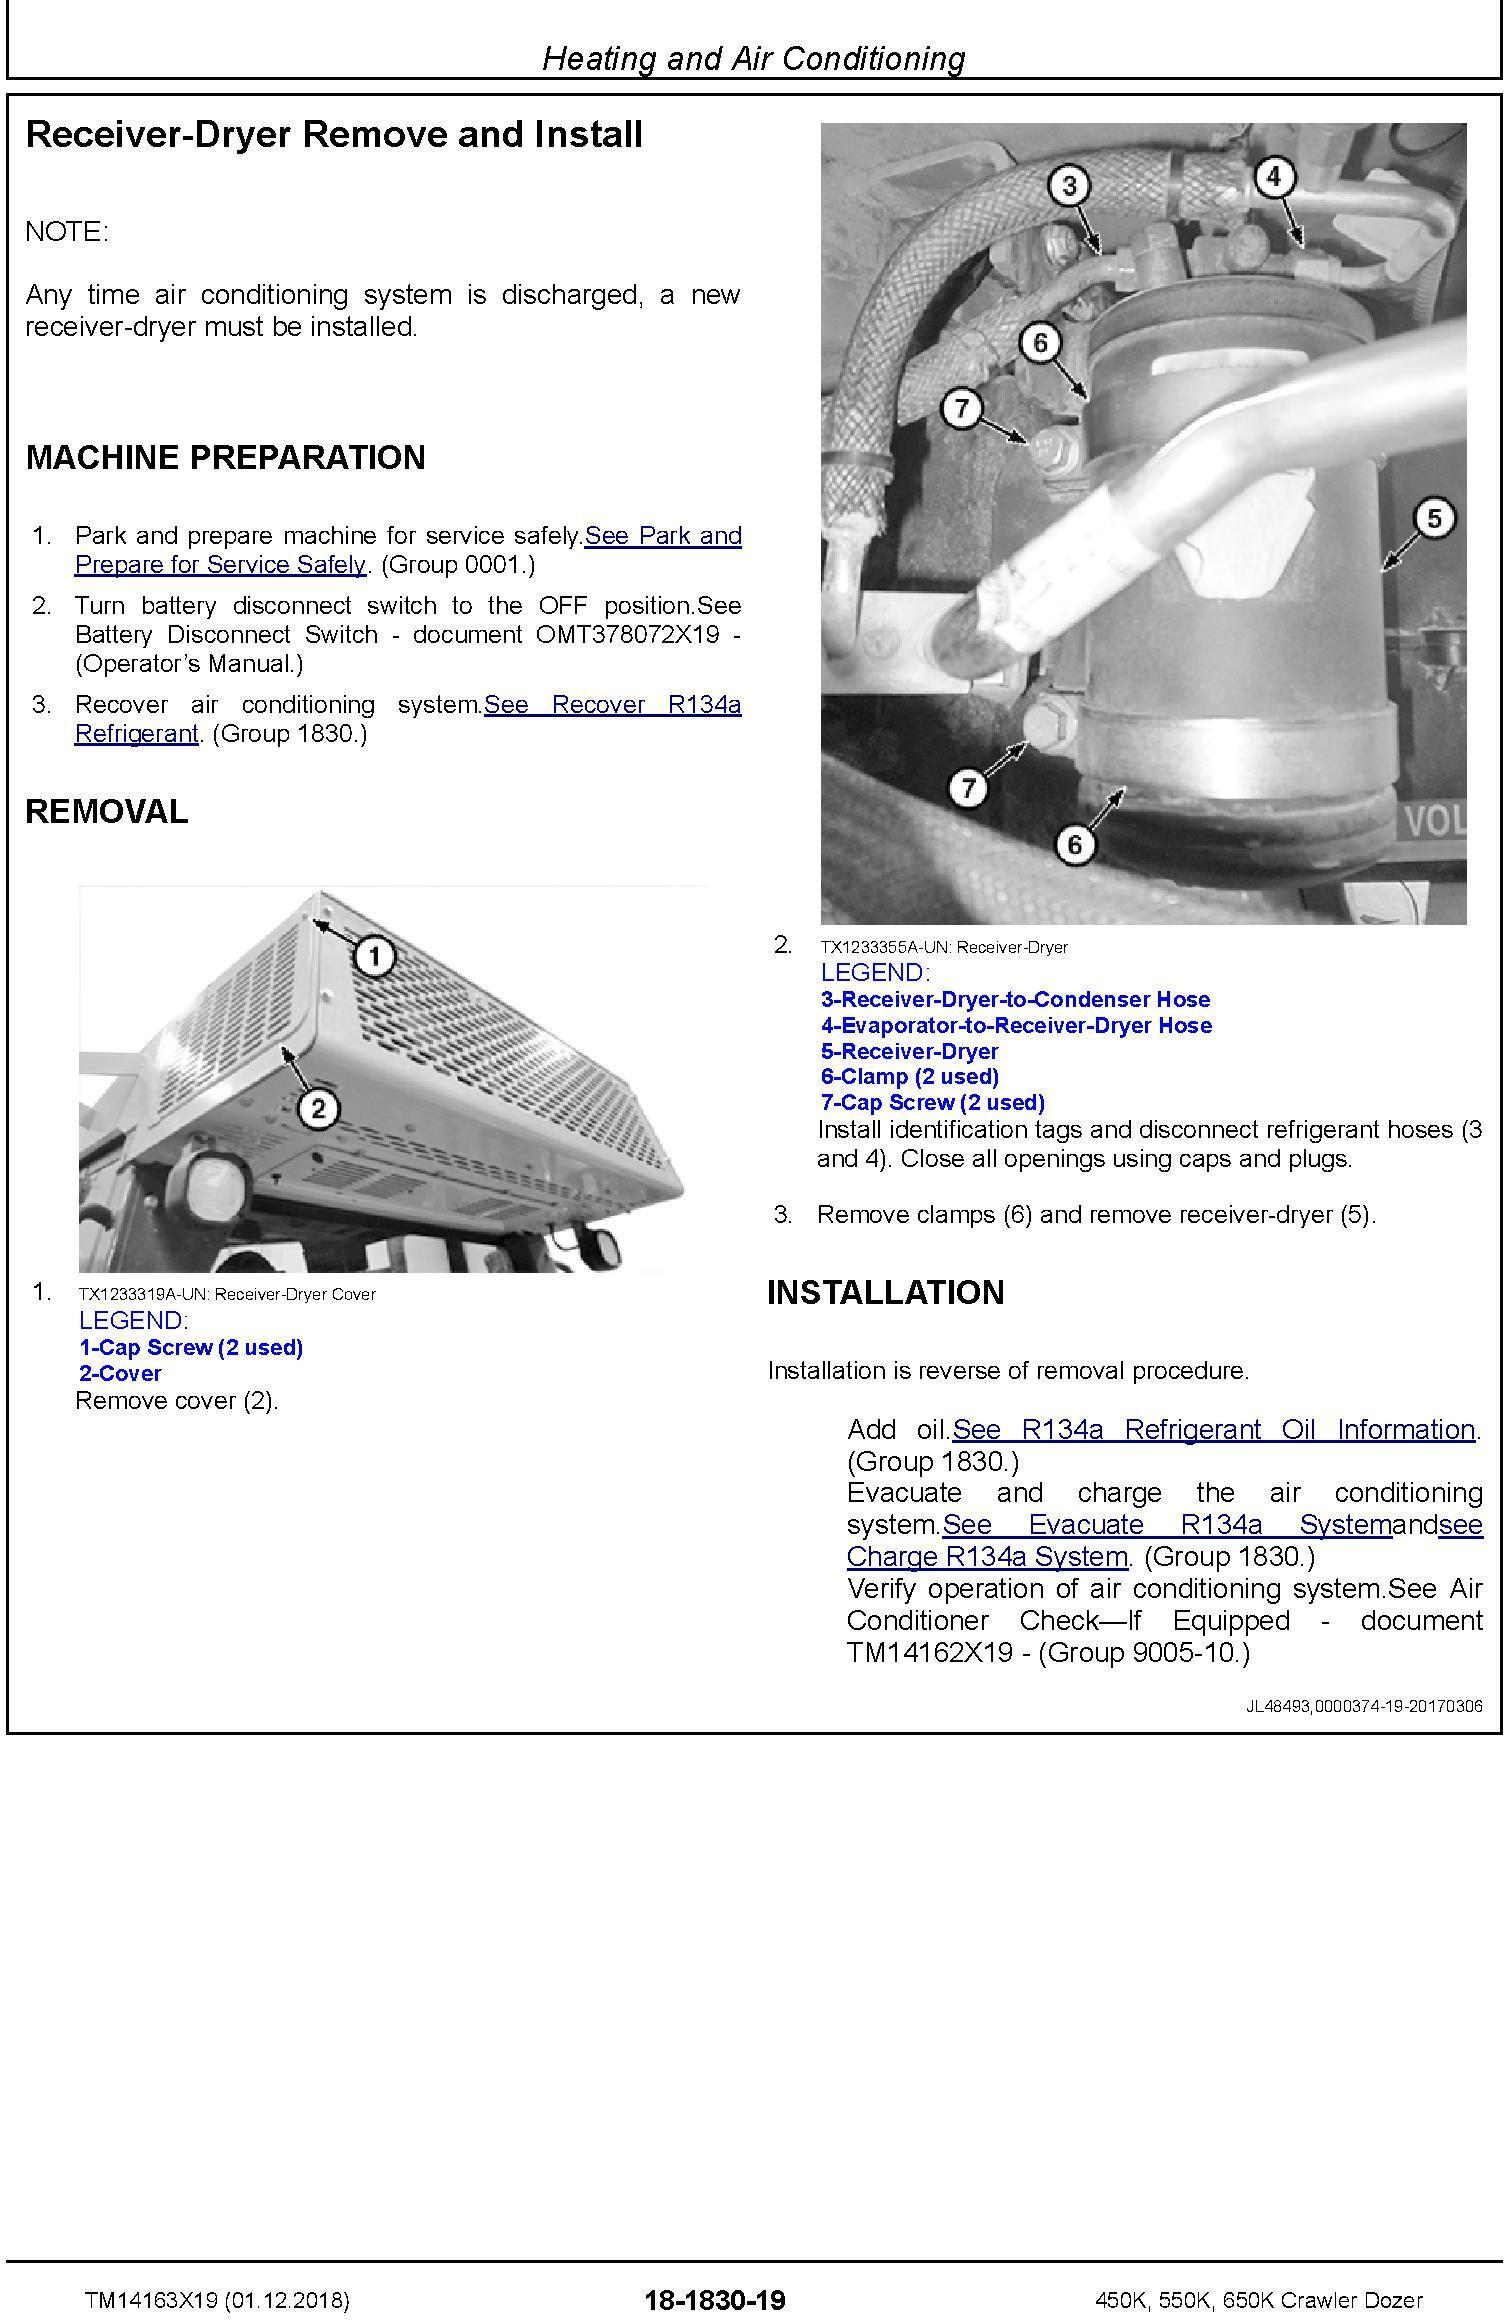 John Deere 450K, 550K, 650K (SN.F305399-) Crawler Dozer Repair Technical Service Manual (TM14163X19) - 3